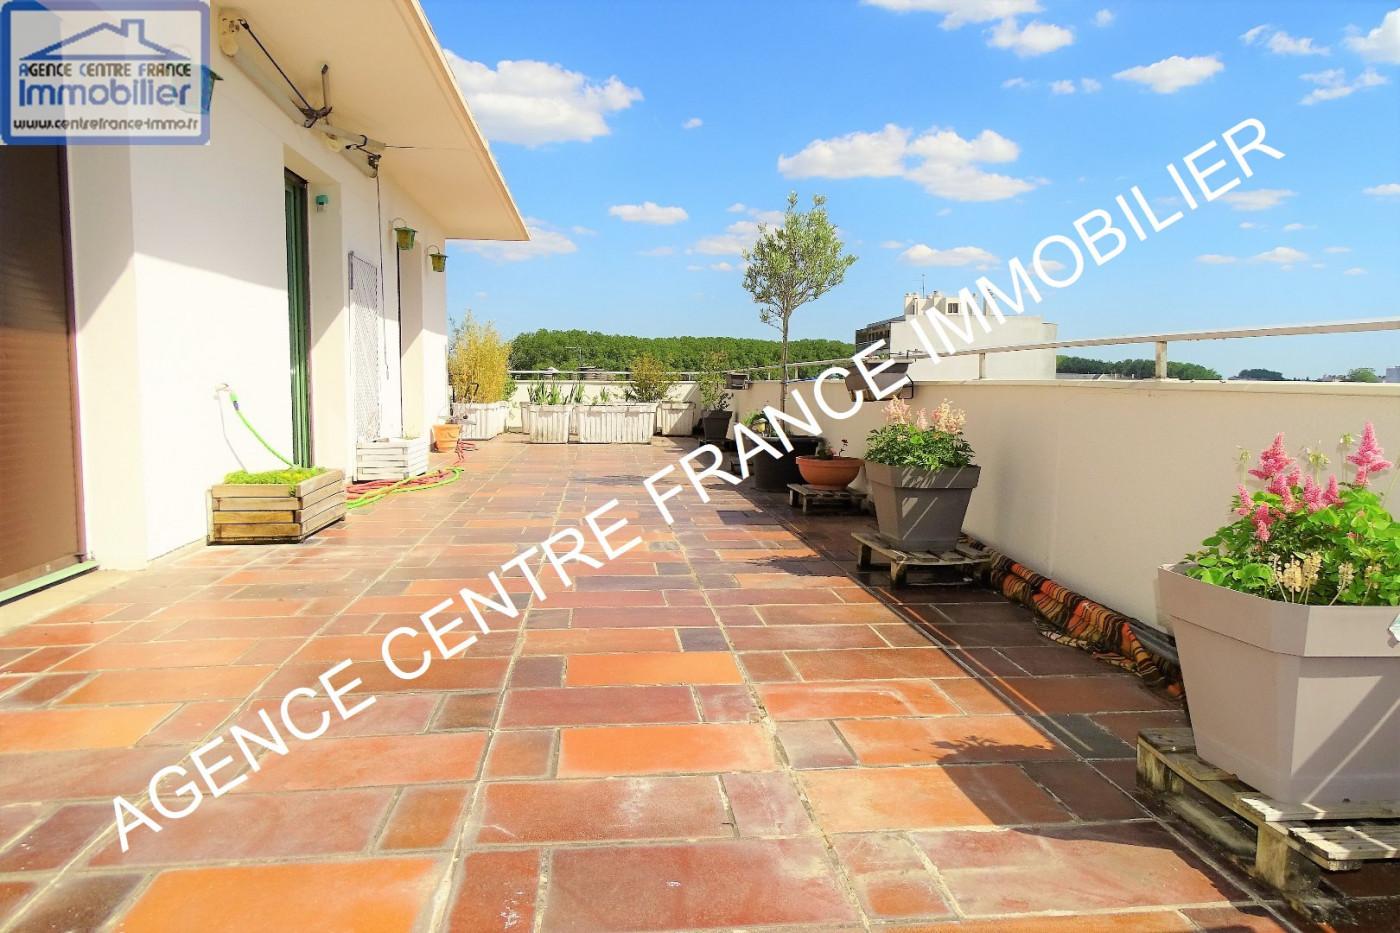 A vendre  Bourges   Réf 030011519 - Agence centre france immobilier